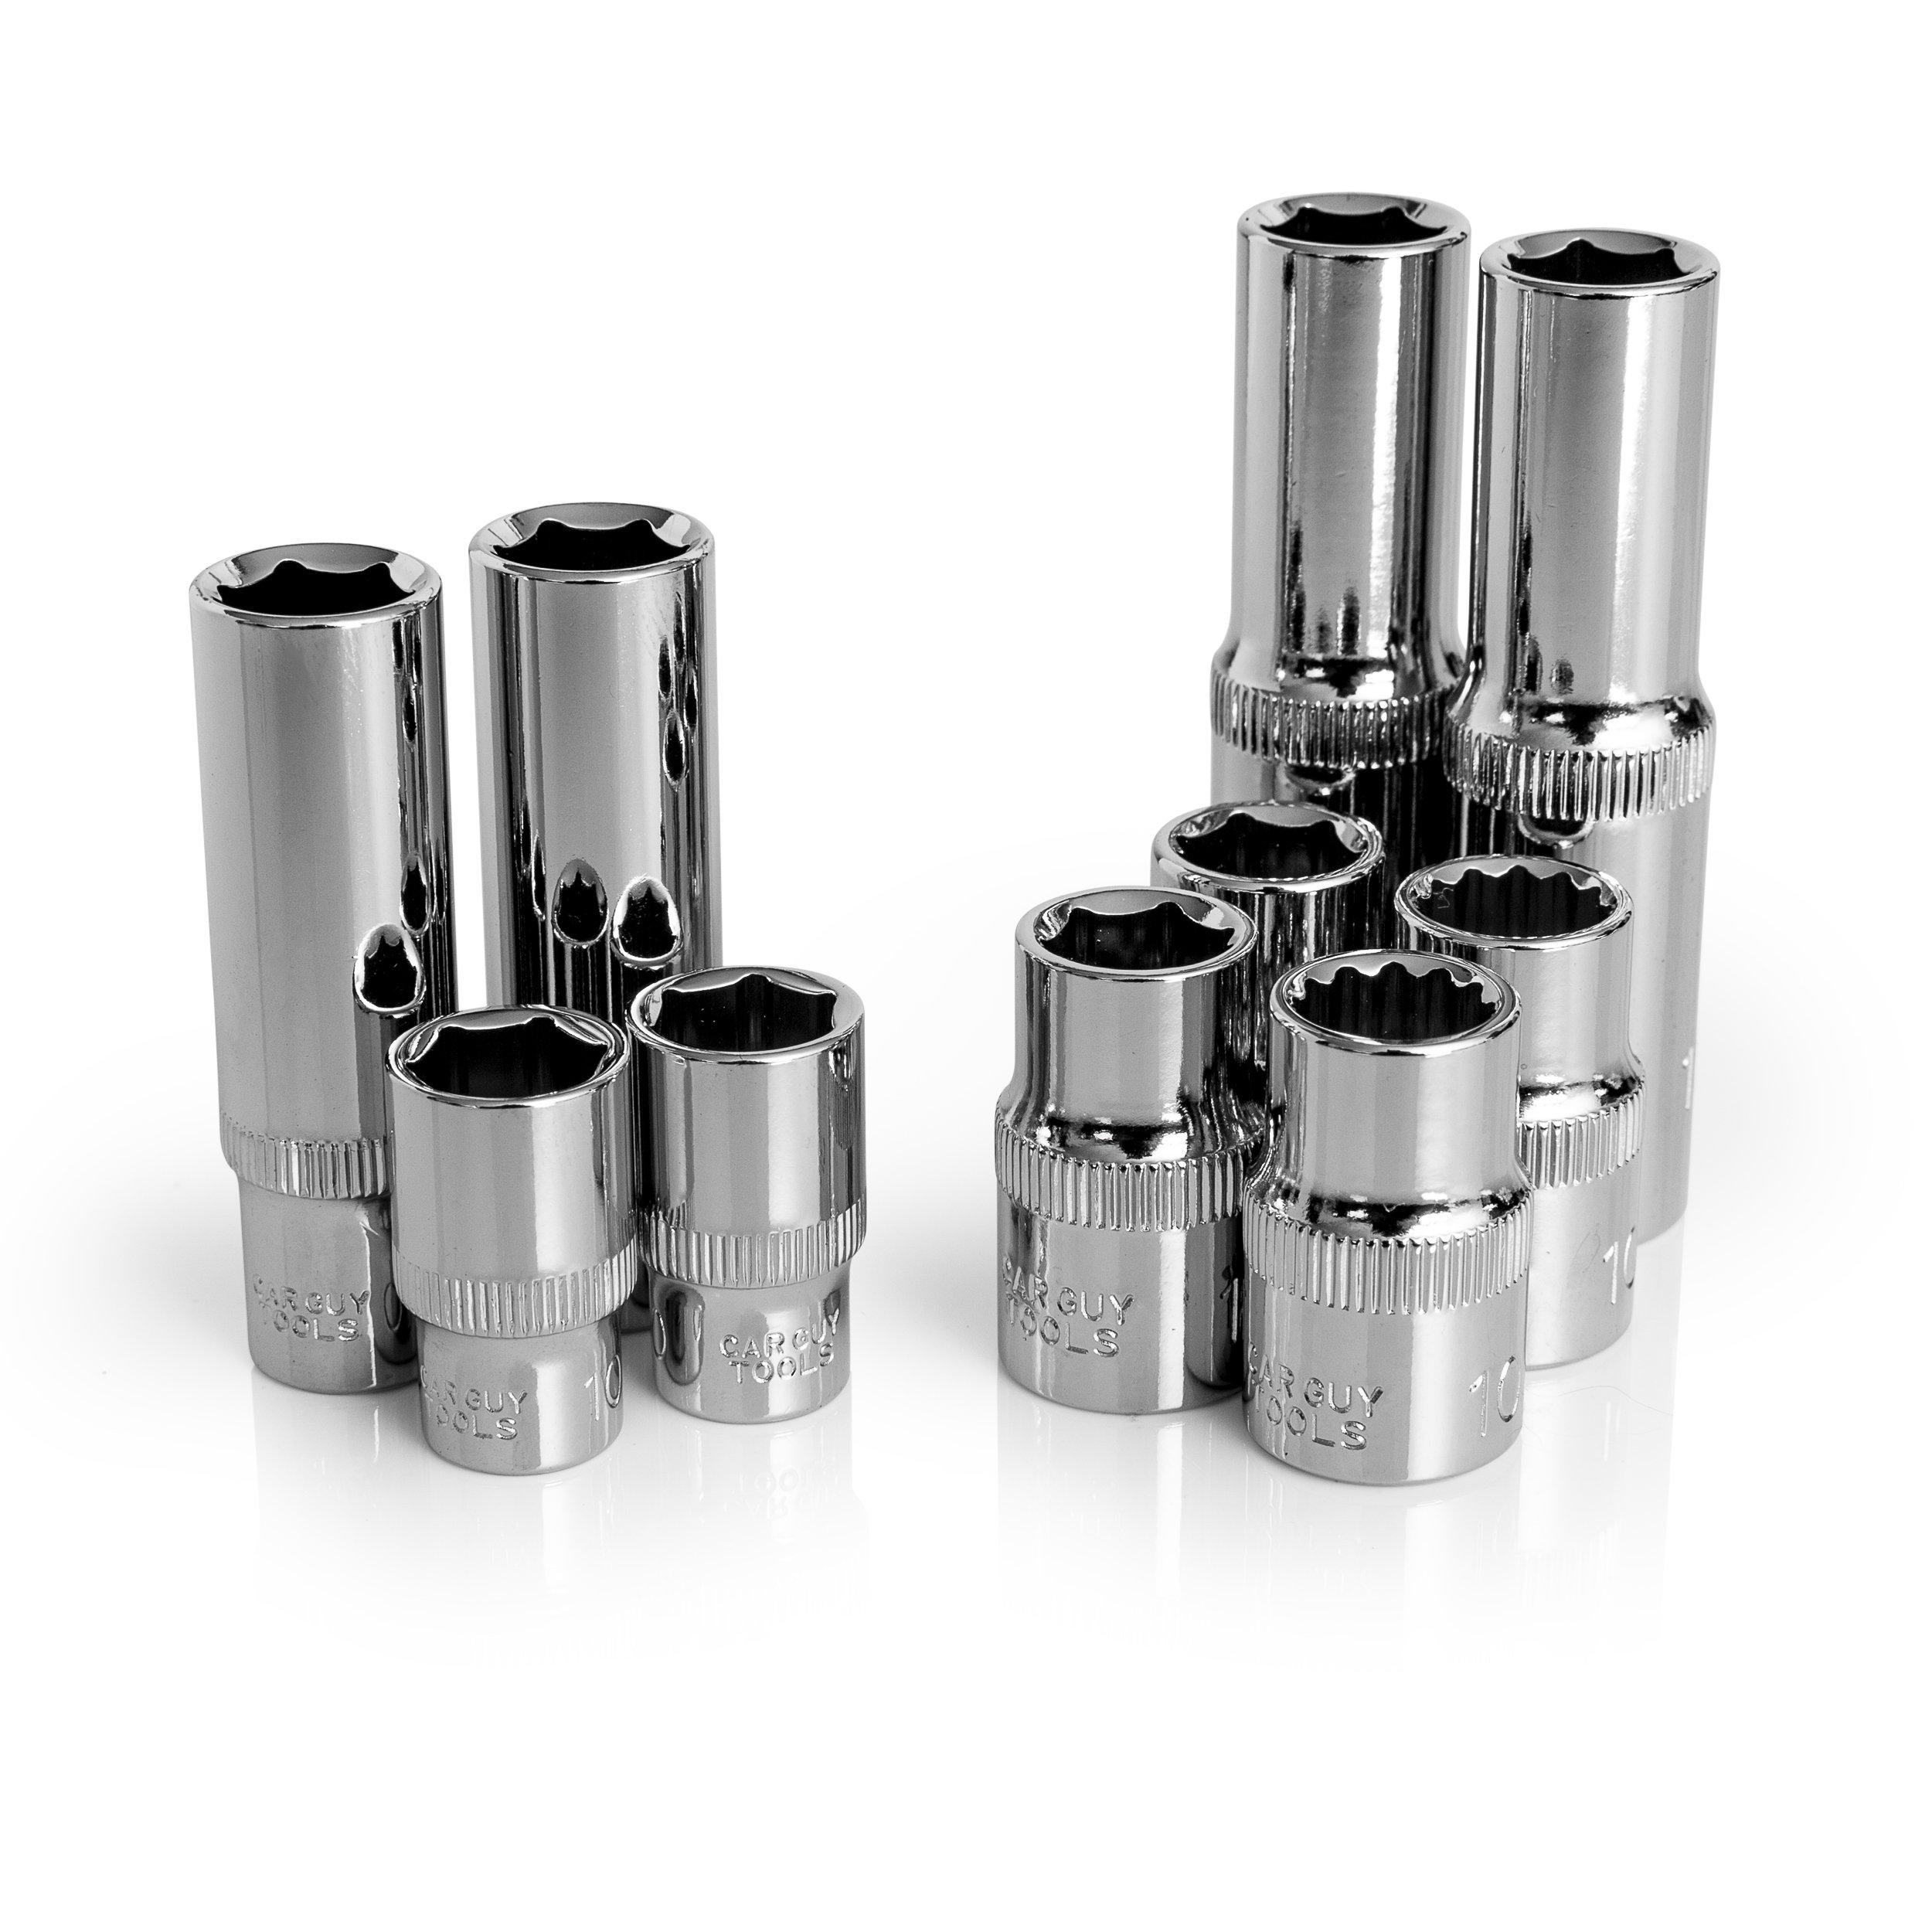 10mm Socket Ten Pack (Multi-Type)